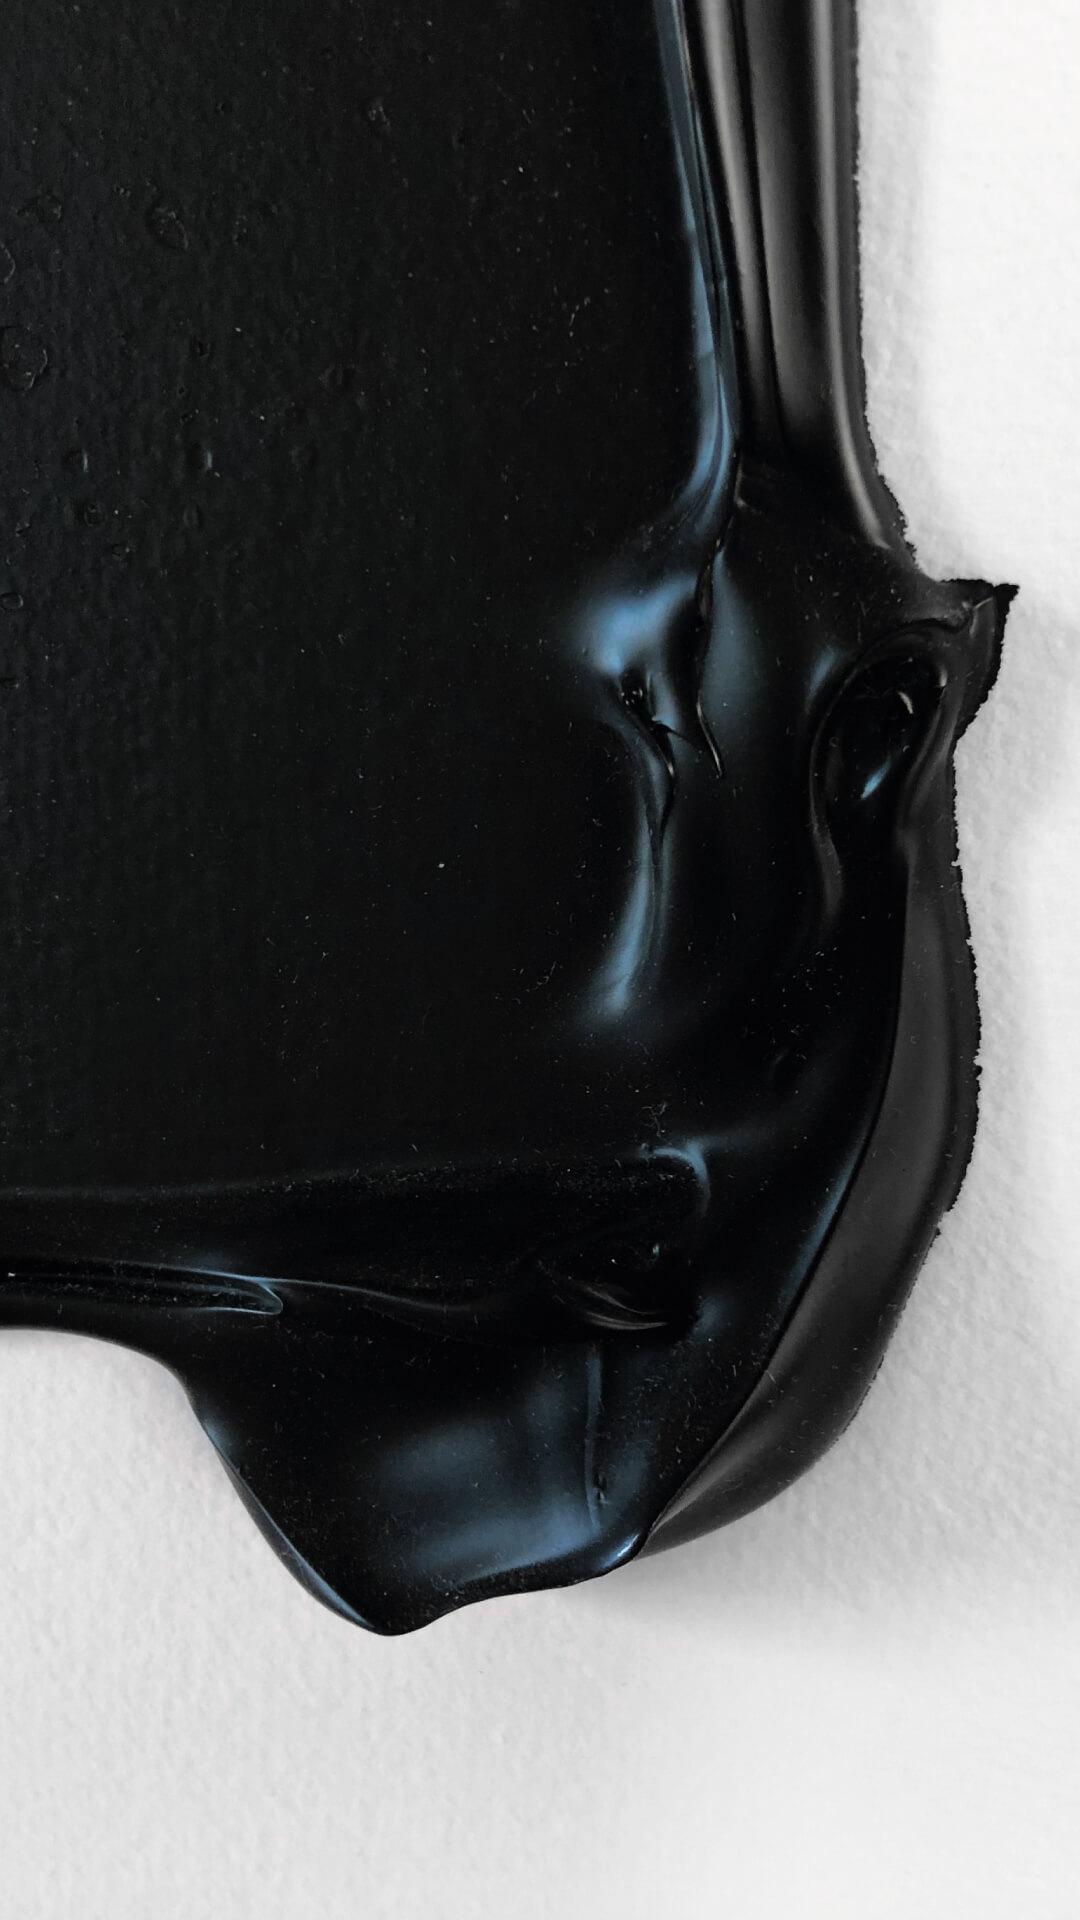 15-ENCONTREMONOS-AARON-NACHTAILER-ART-ARTIST-VERTICAL